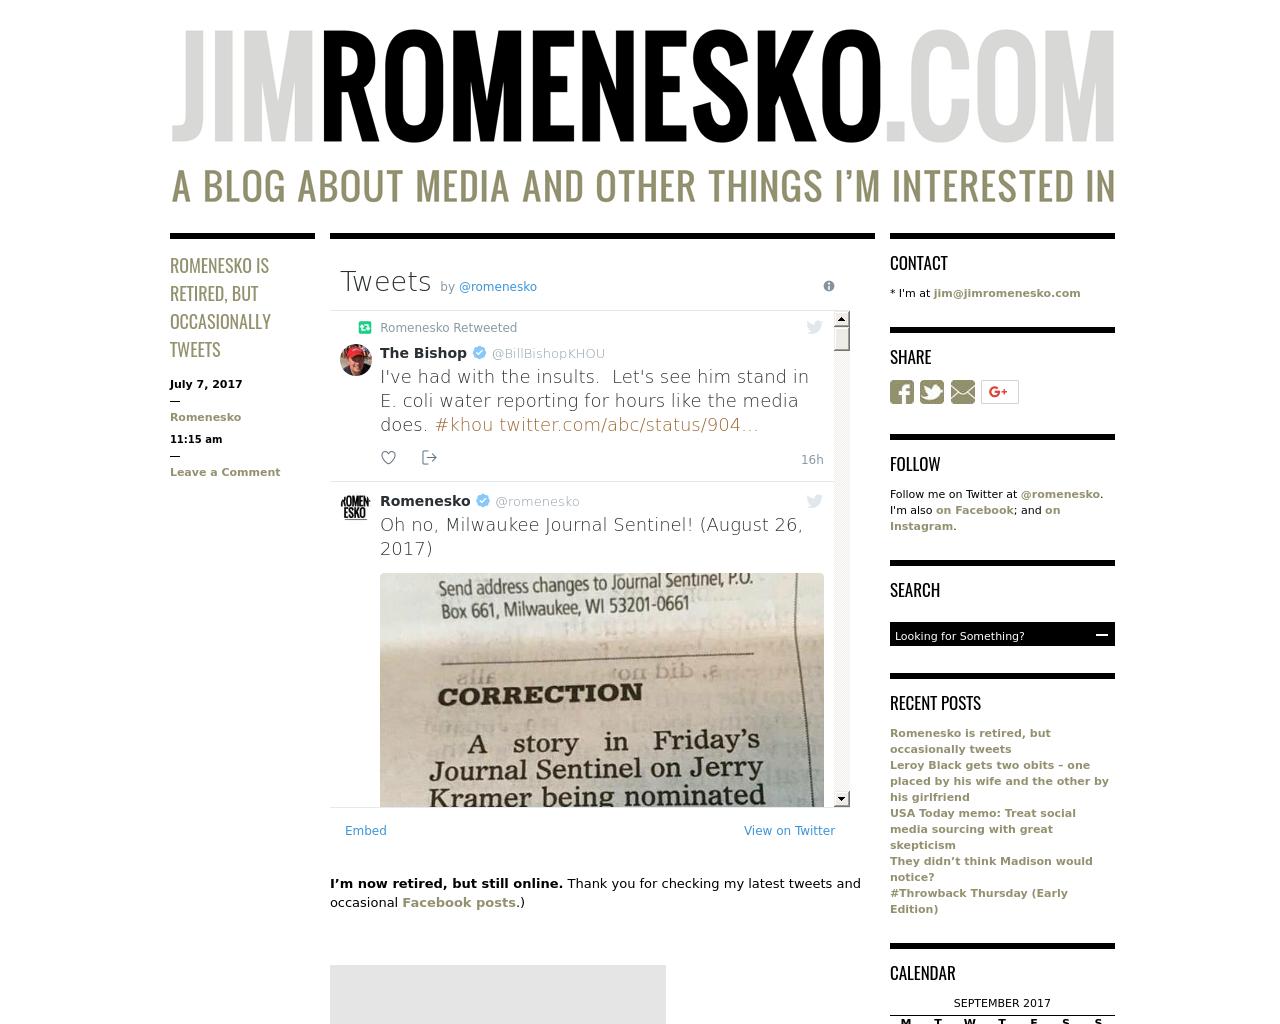 Jim-Romenesko-Advertising-Reviews-Pricing